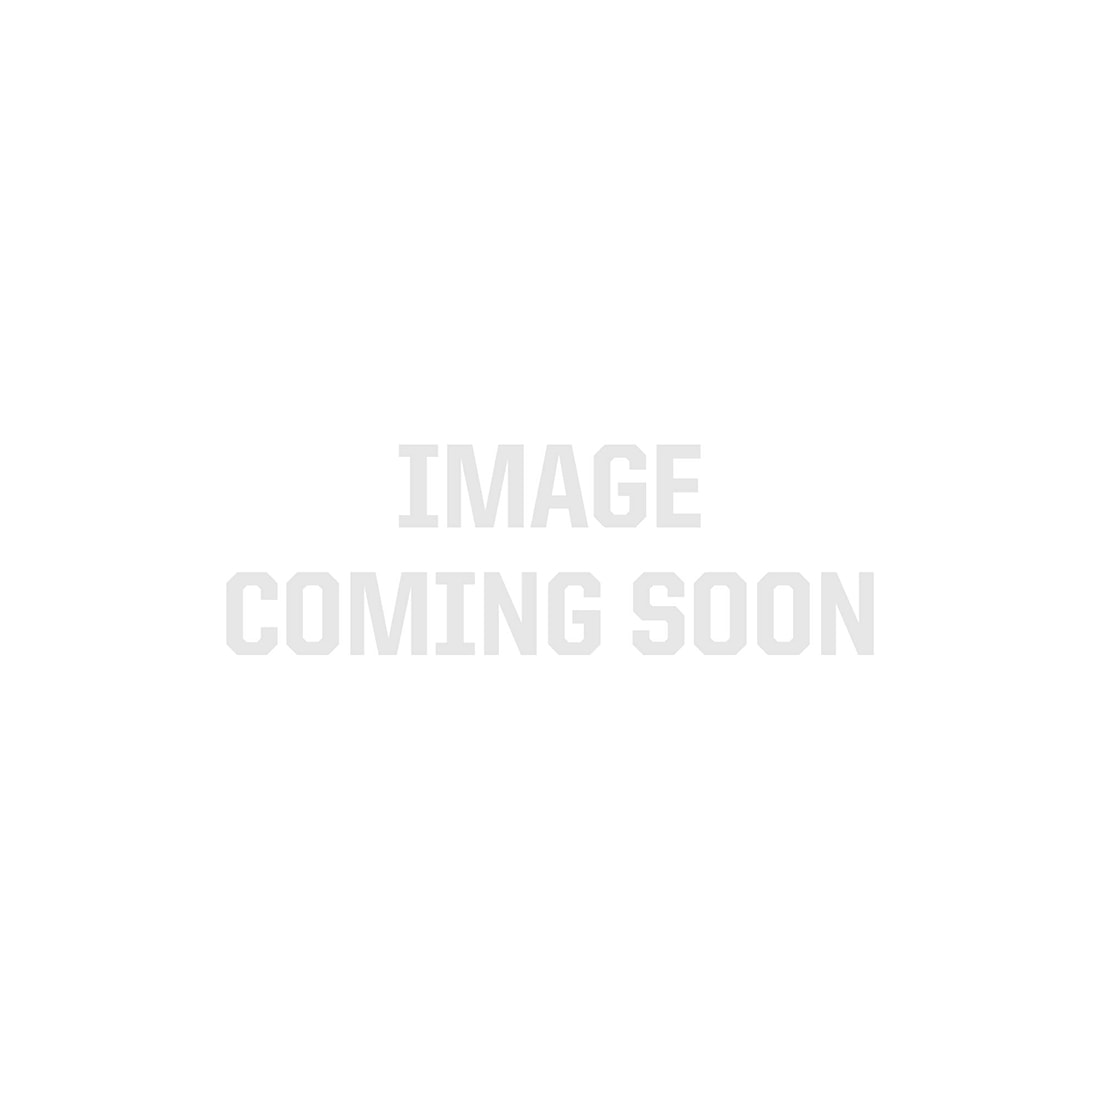 Amber 5050 Single Row CurrentControl LED Strip Light, 60/m, 12mm wide, Sample Kit